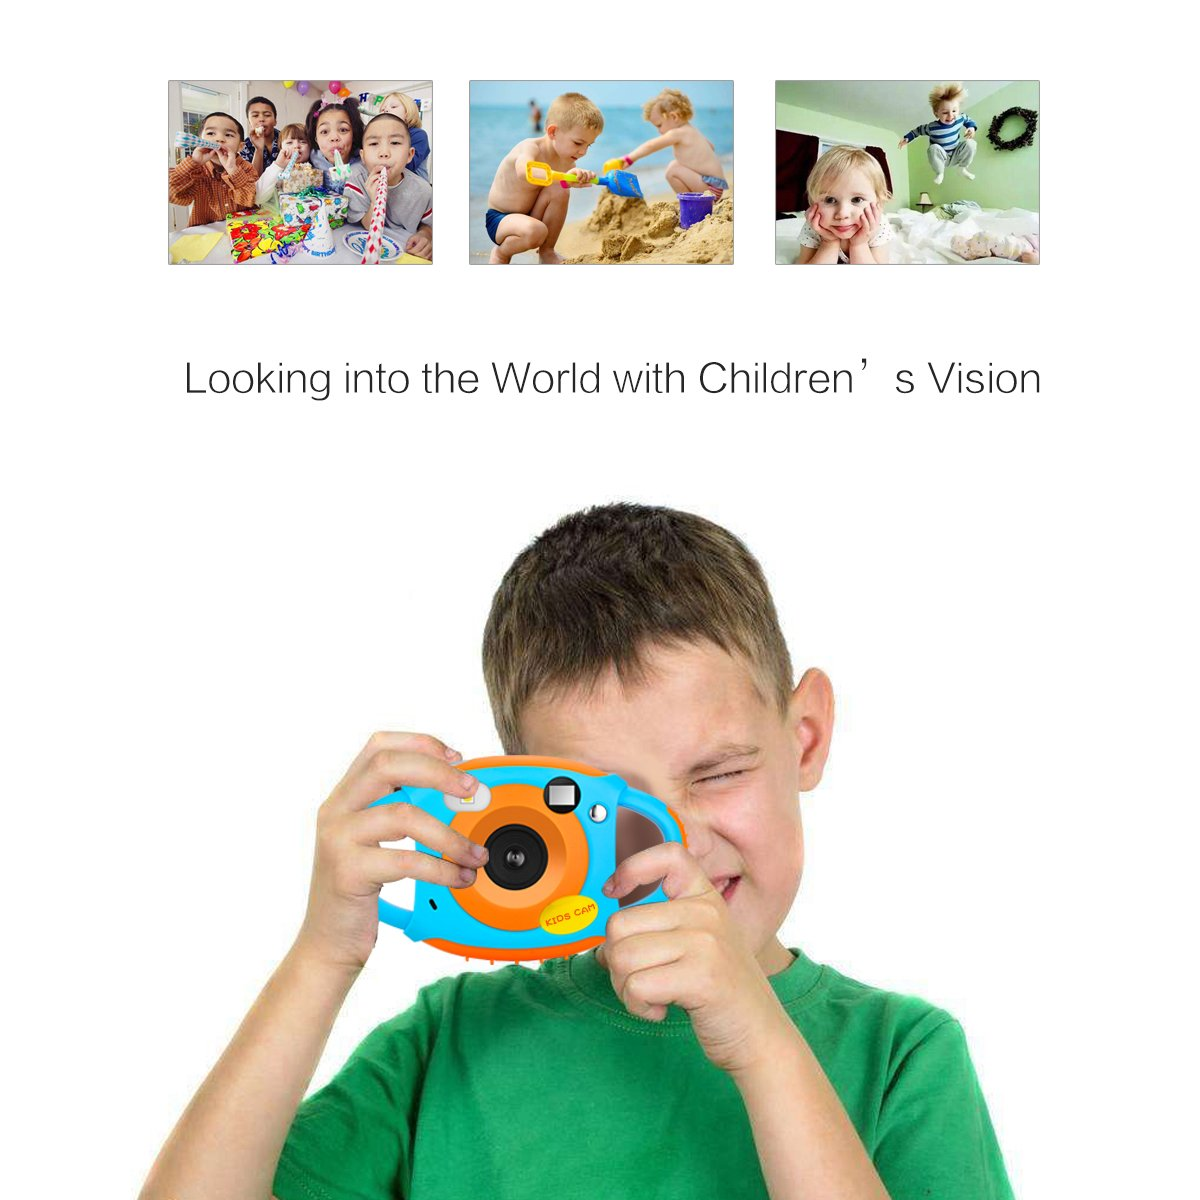 Kids Camera Digital Camera for Kids Digital Video Camera 1.77 HD Color Screen 5 MP Beautiful Camera for Kids by LongOu (Image #7)